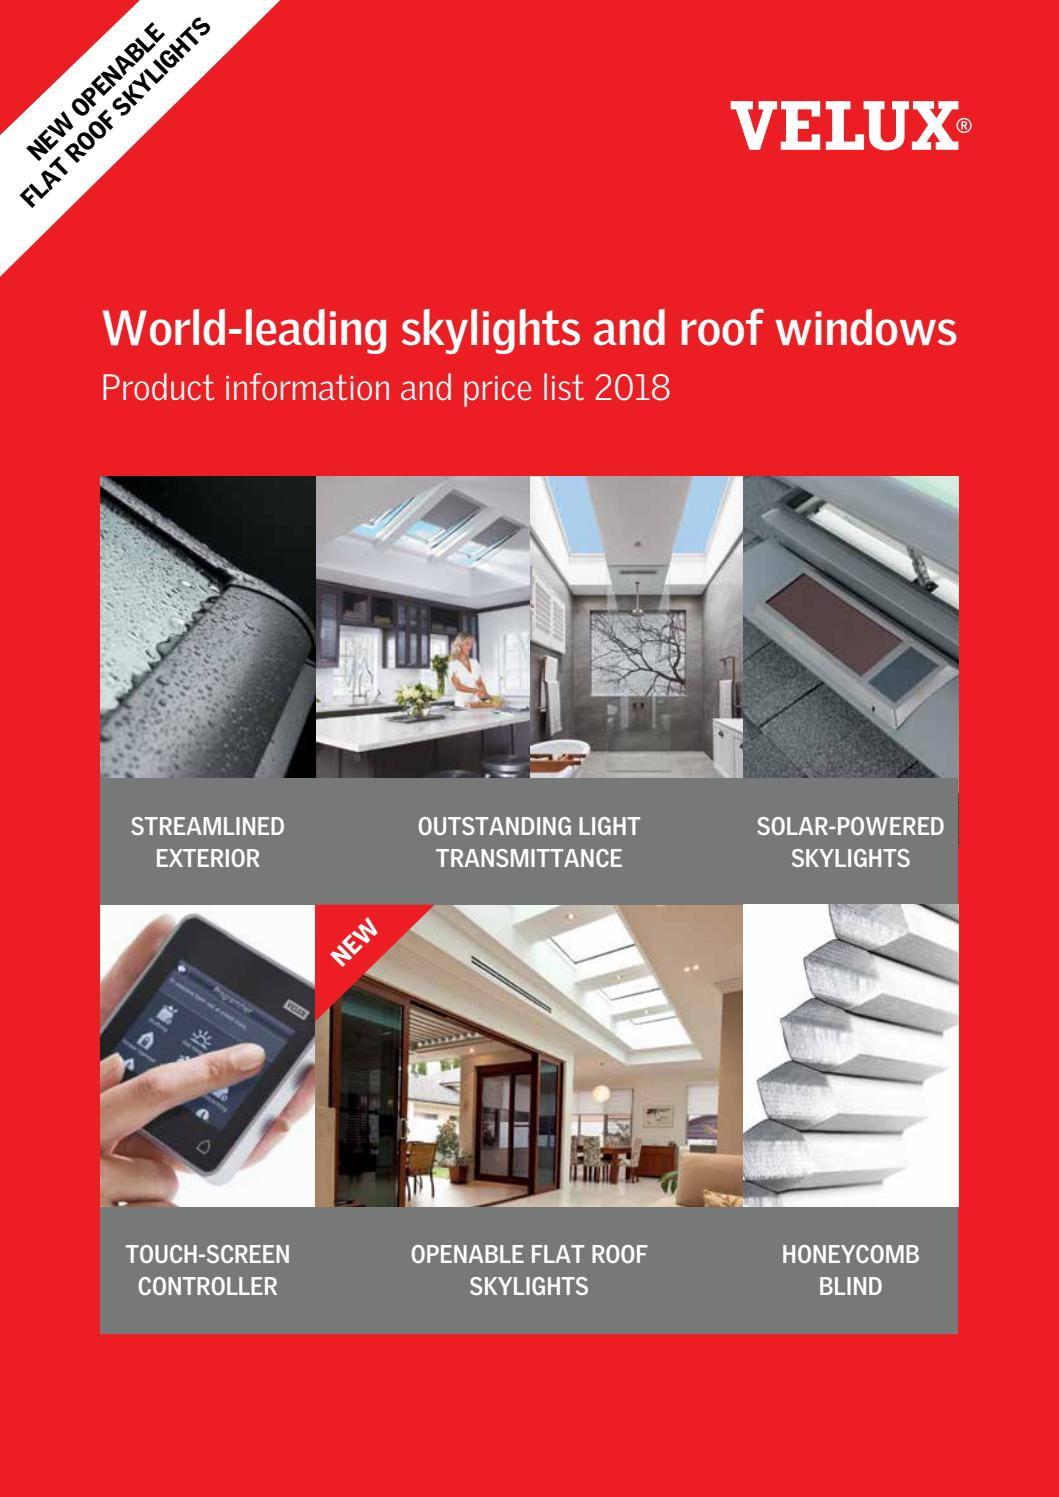 New Velux Brochure by Skylights WA - issuu